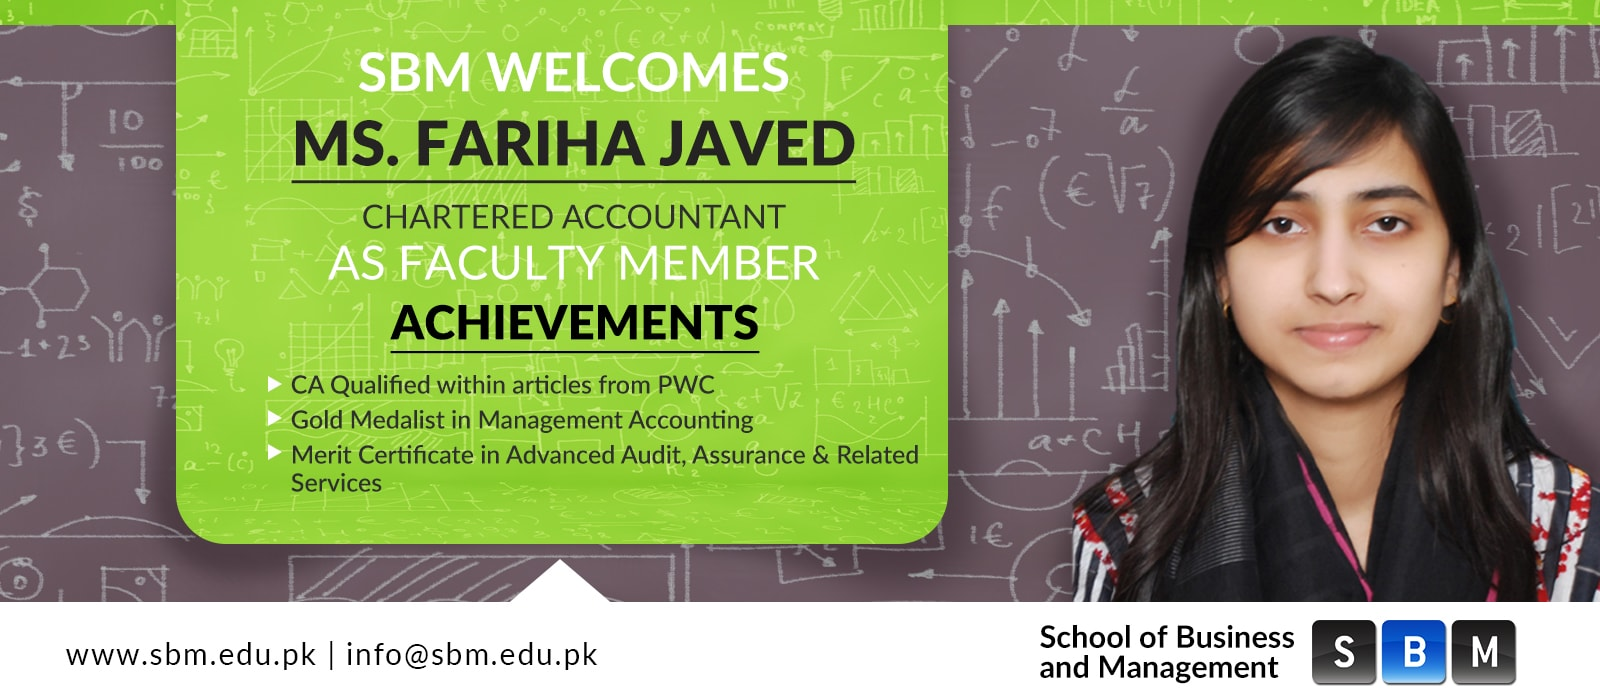 Ms. Fariha Javed has joined SBM as Faculty Member